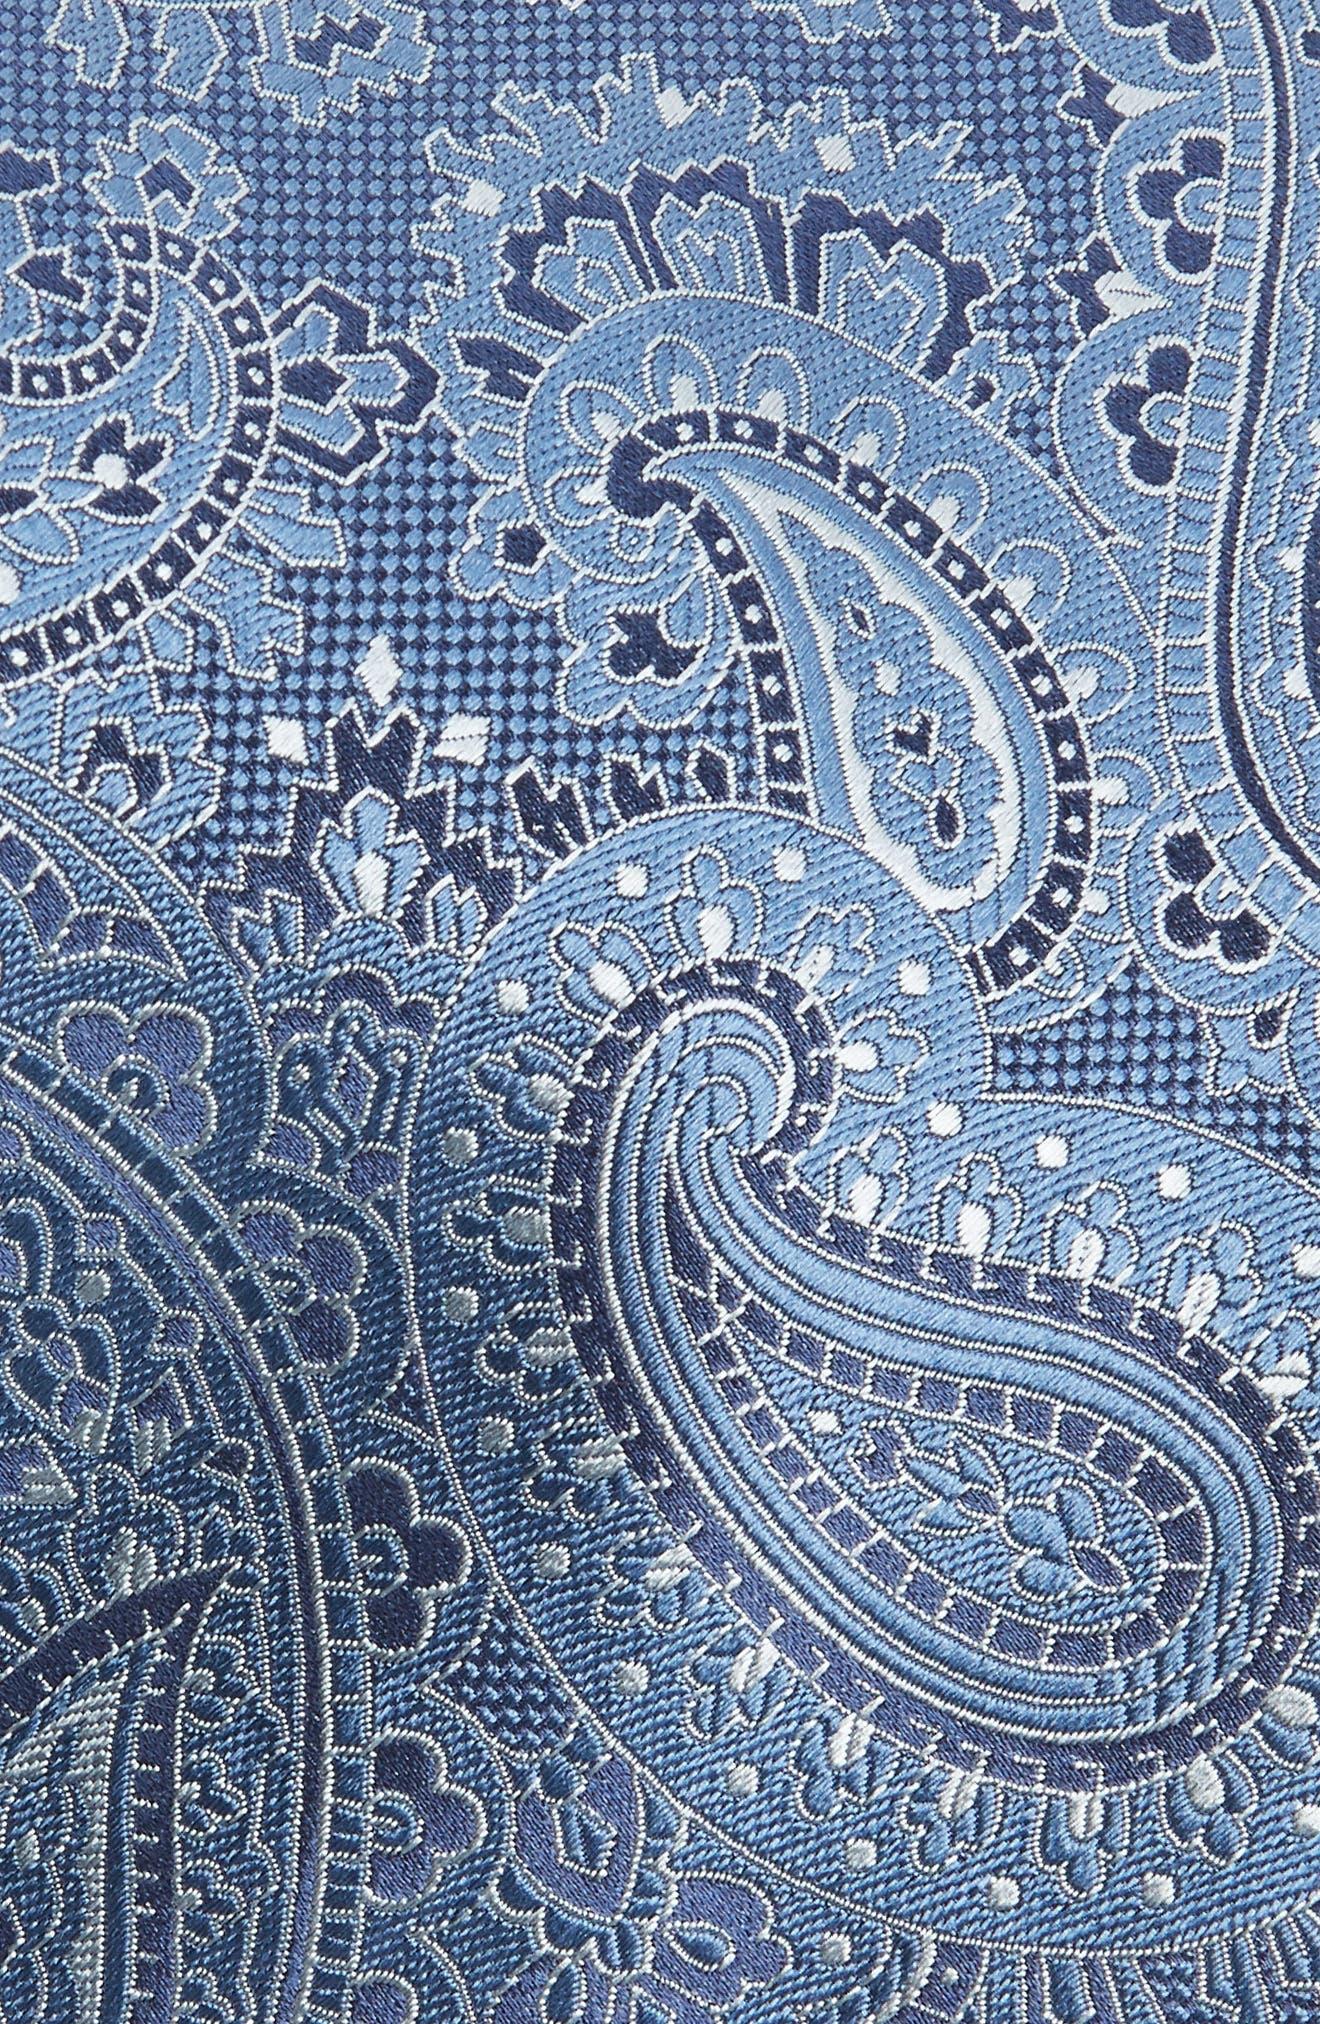 Paisley Silk Tie,                             Alternate thumbnail 2, color,                             BLUE MULTI